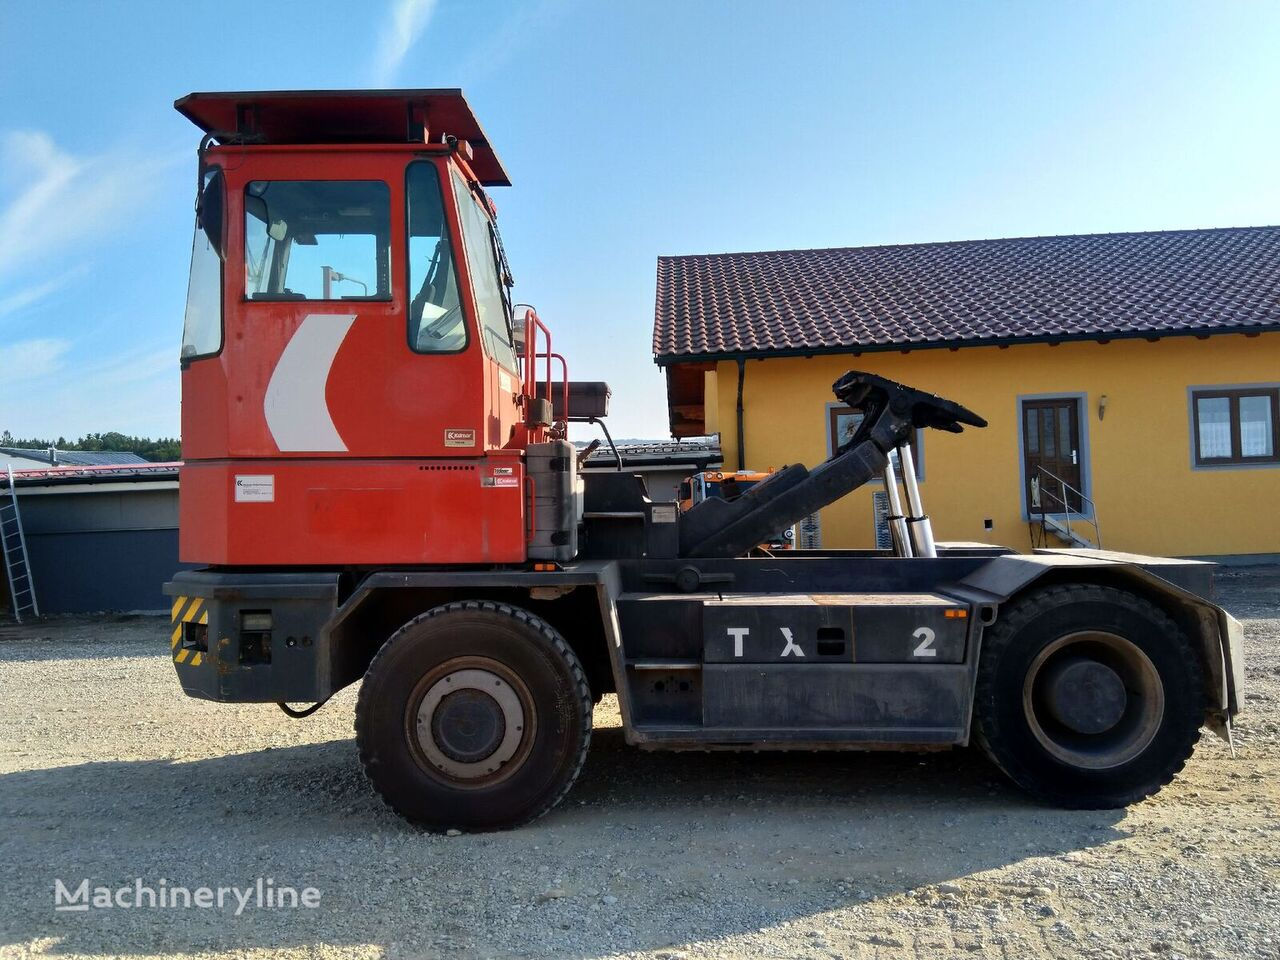 KALMAR TRX 252 tractor de terminal